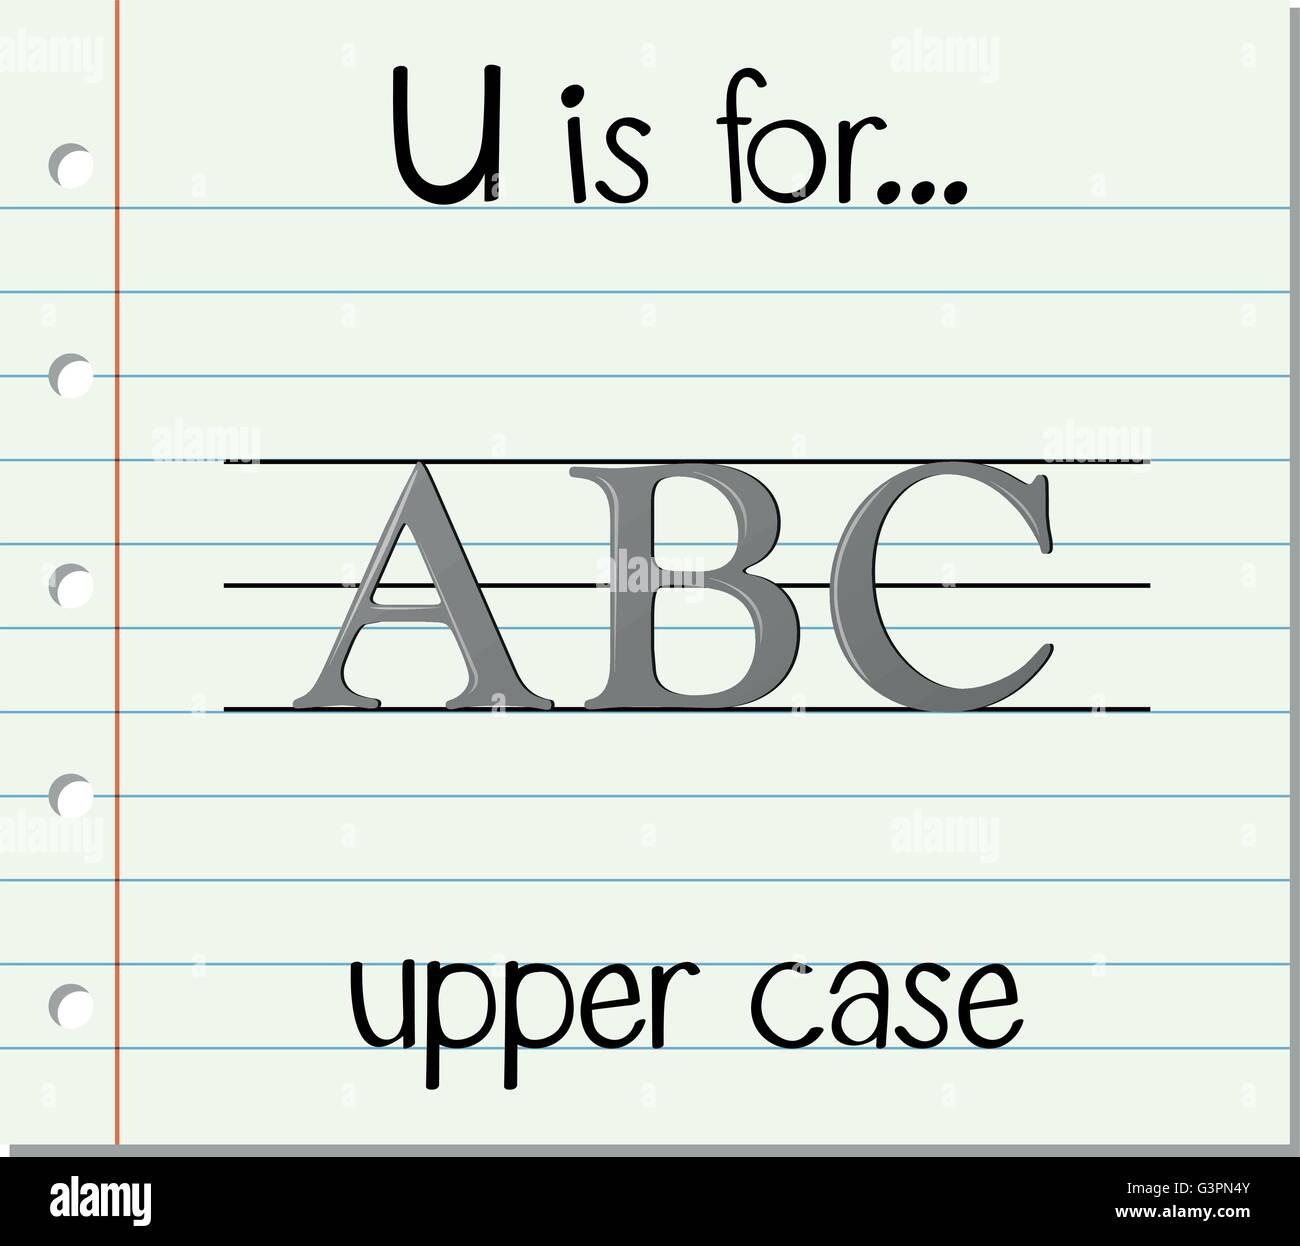 Flashcard letter U is for upper case illustration - Stock Vector